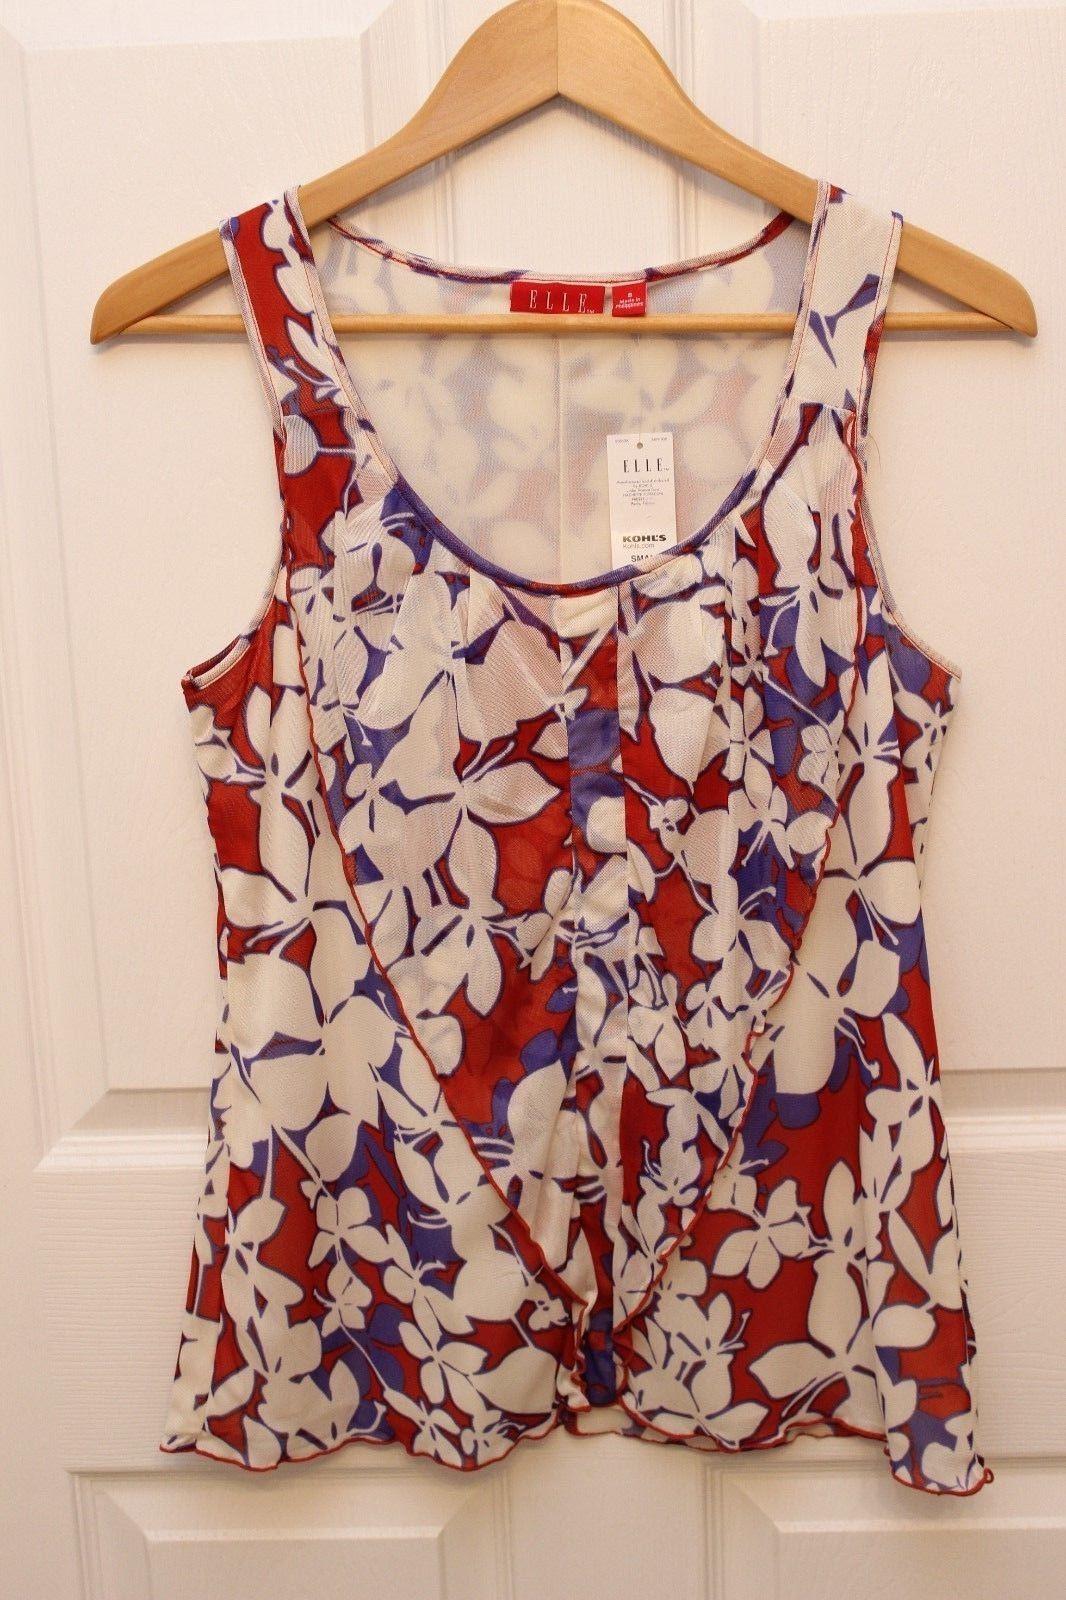 Elle Sleeveless Pleated V Ruffle Tank Top Size S  floral chiffon mesh detail  - $17.32